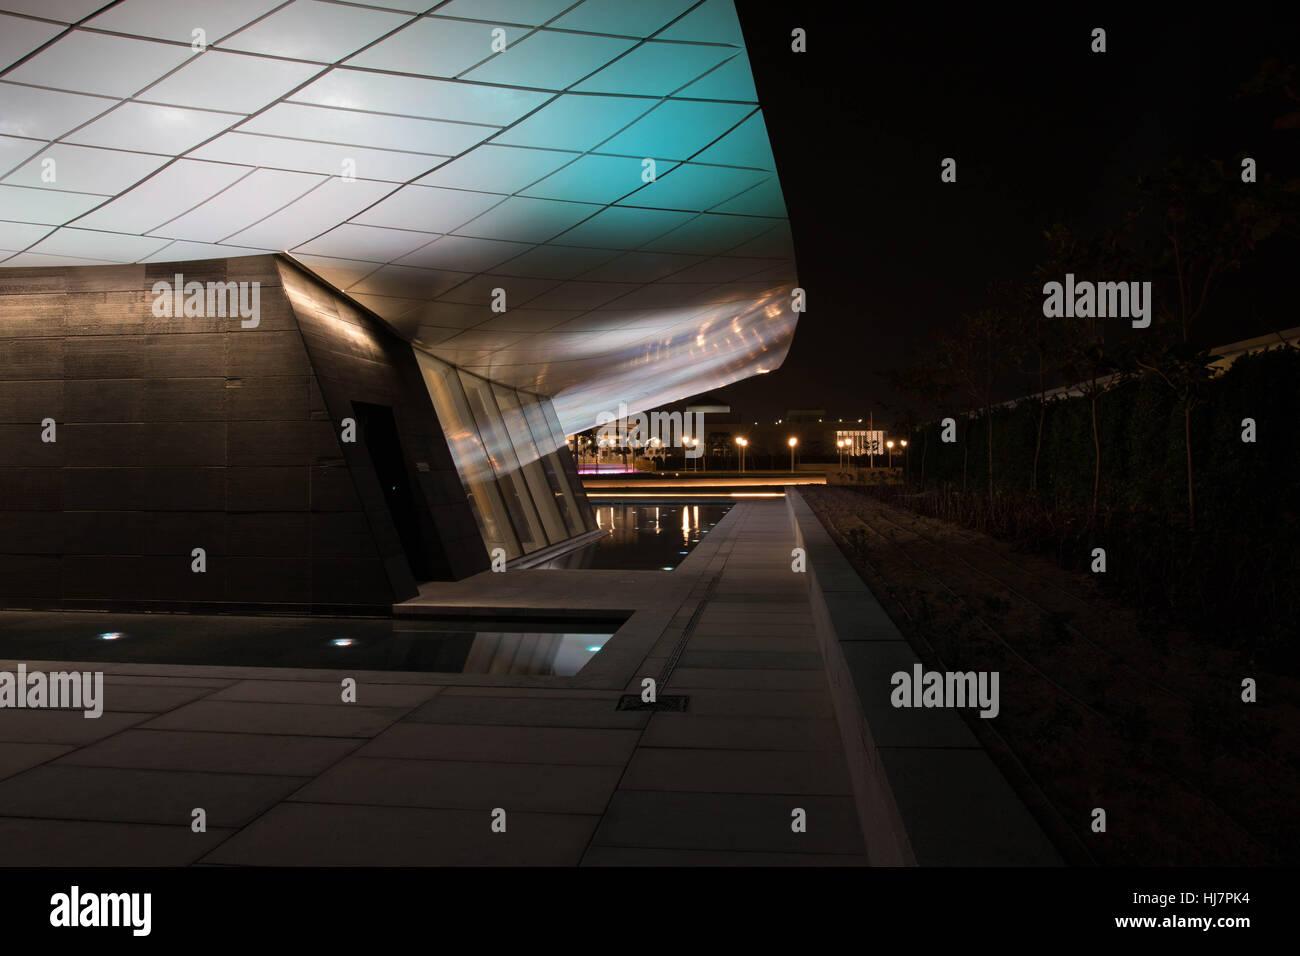 Etihad museum rear of building Dubai - Stock Image